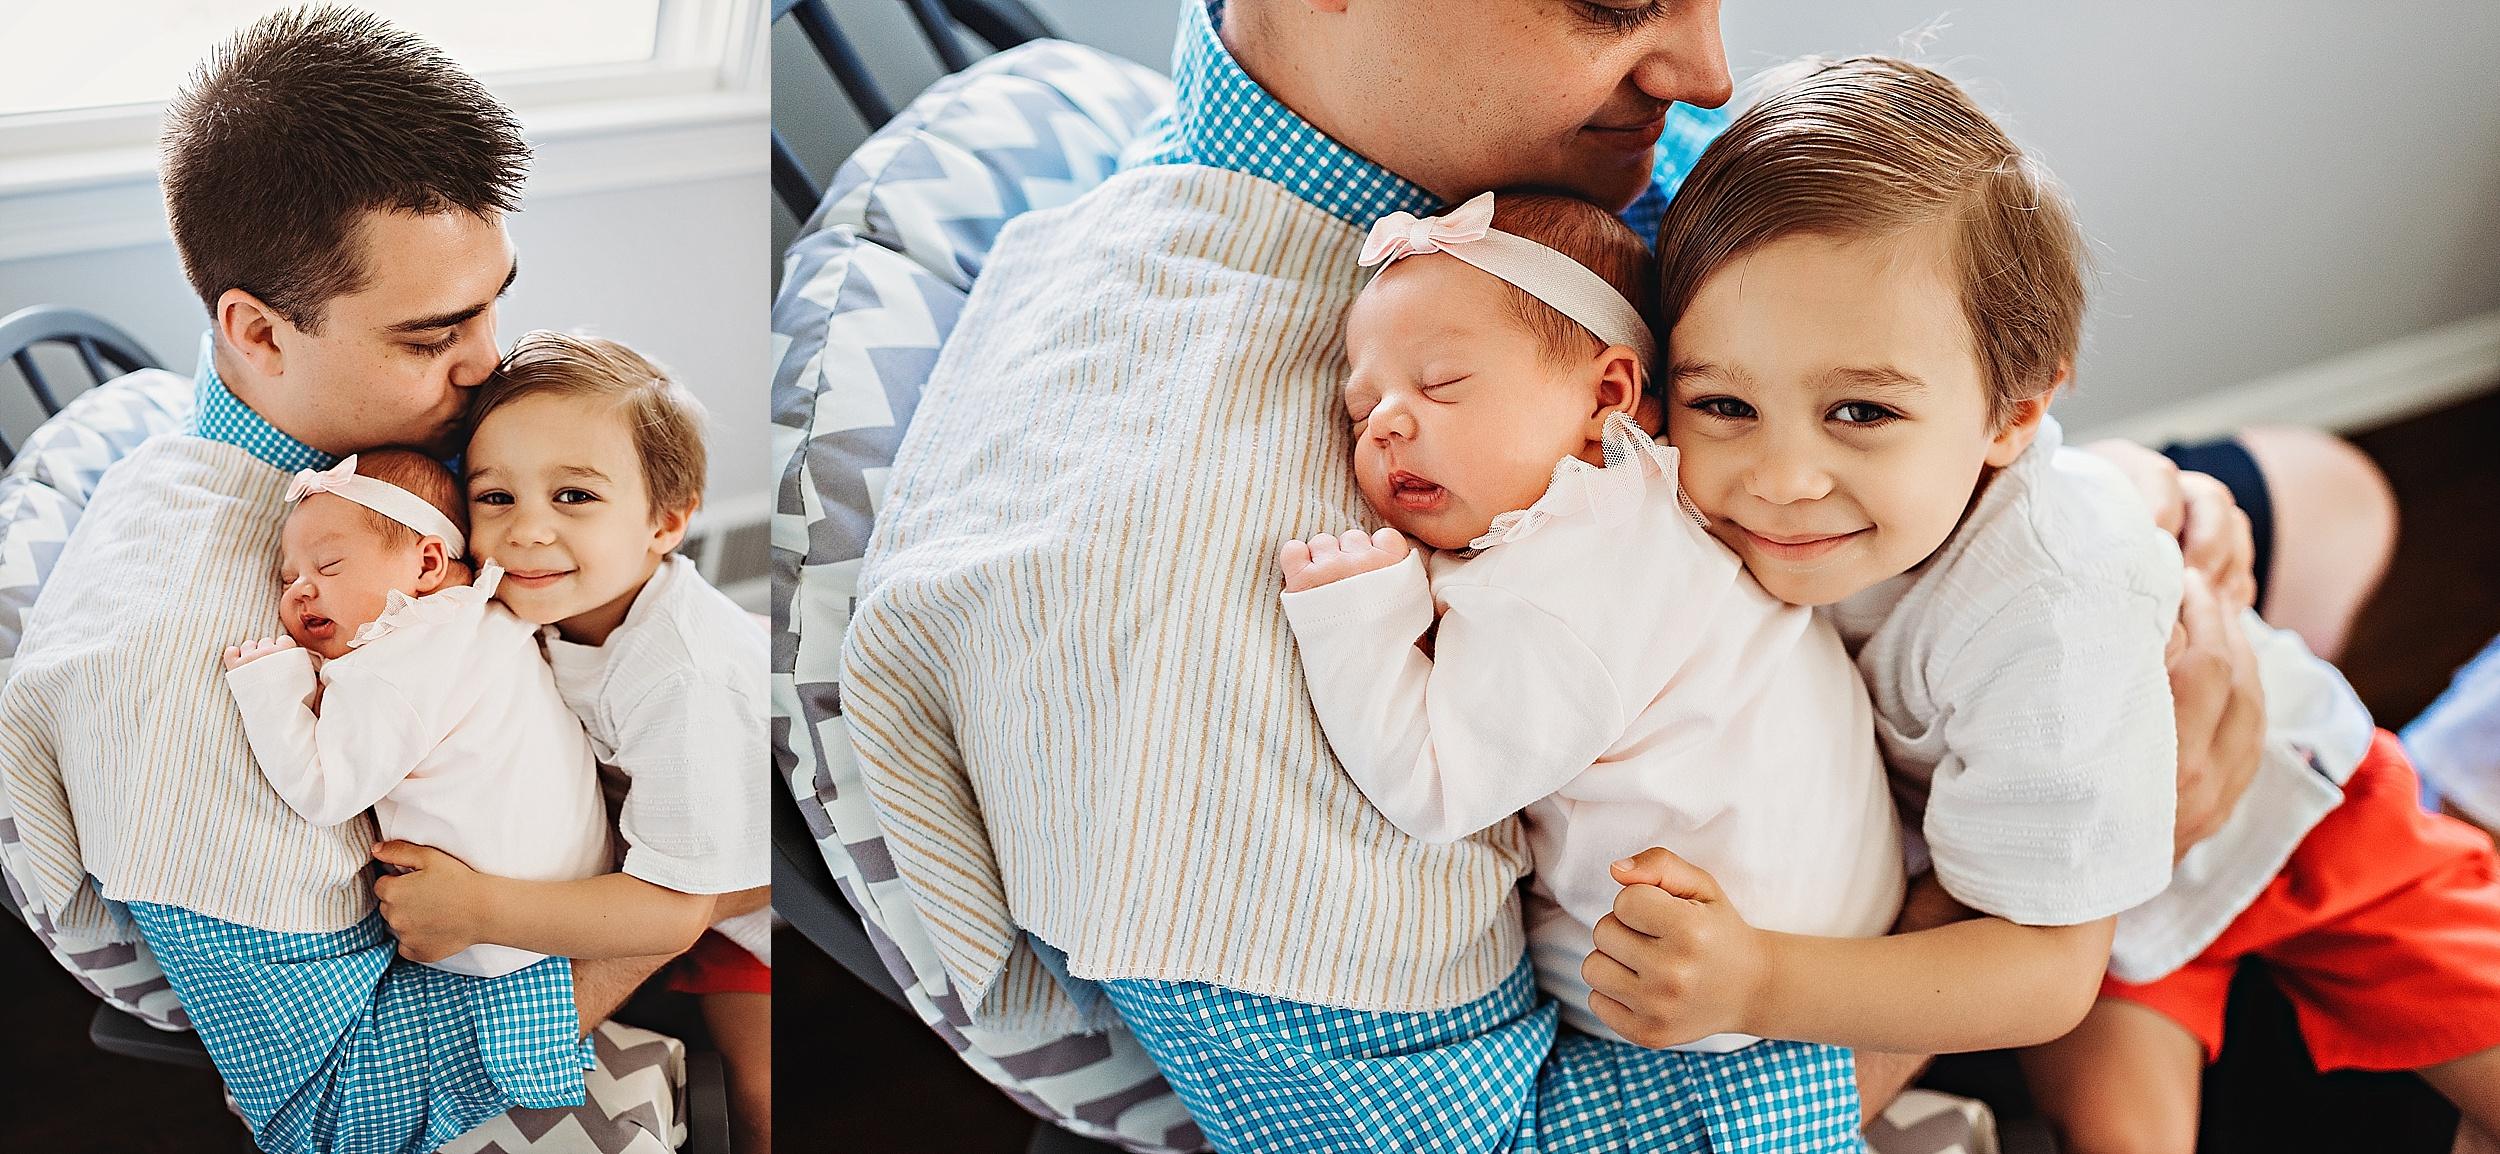 lauren-grayson-photography-akron-cleveland-ohio-photographer-family-newborn-home-photo-session-grace-a_0277.jpg